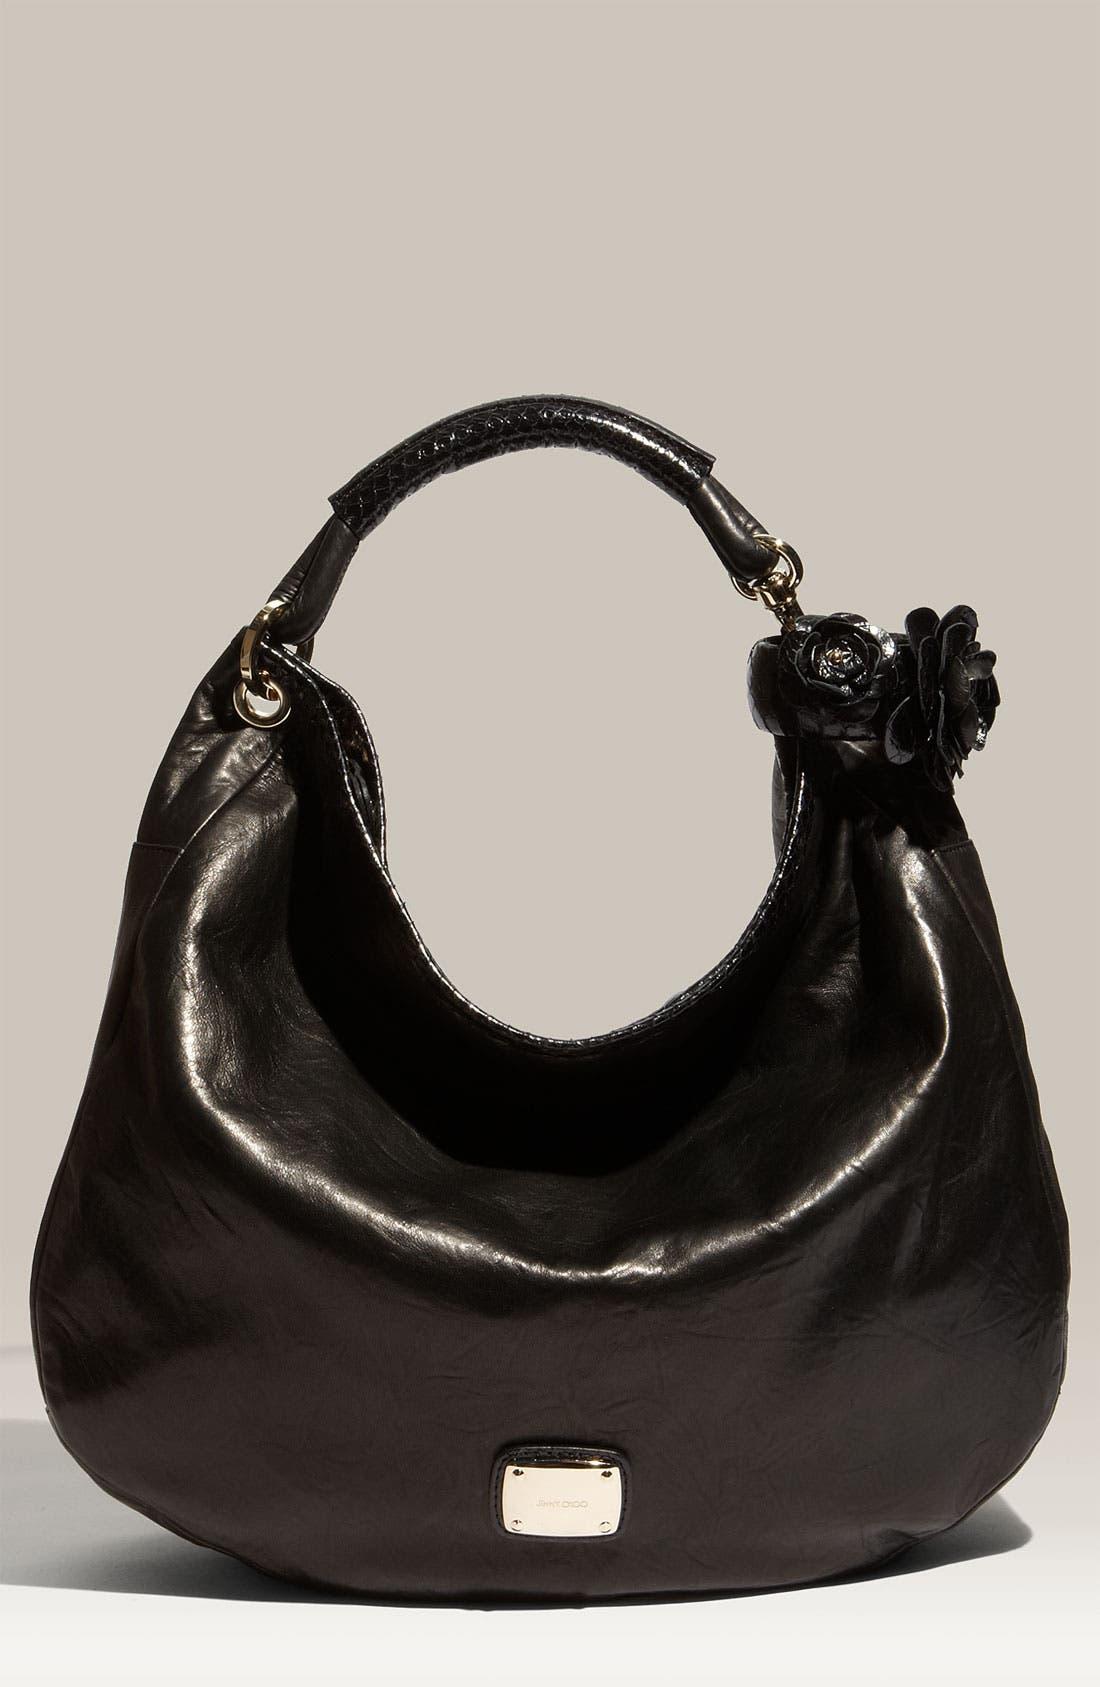 Main Image - Jimmy Choo 'Sky' Leather Hobo